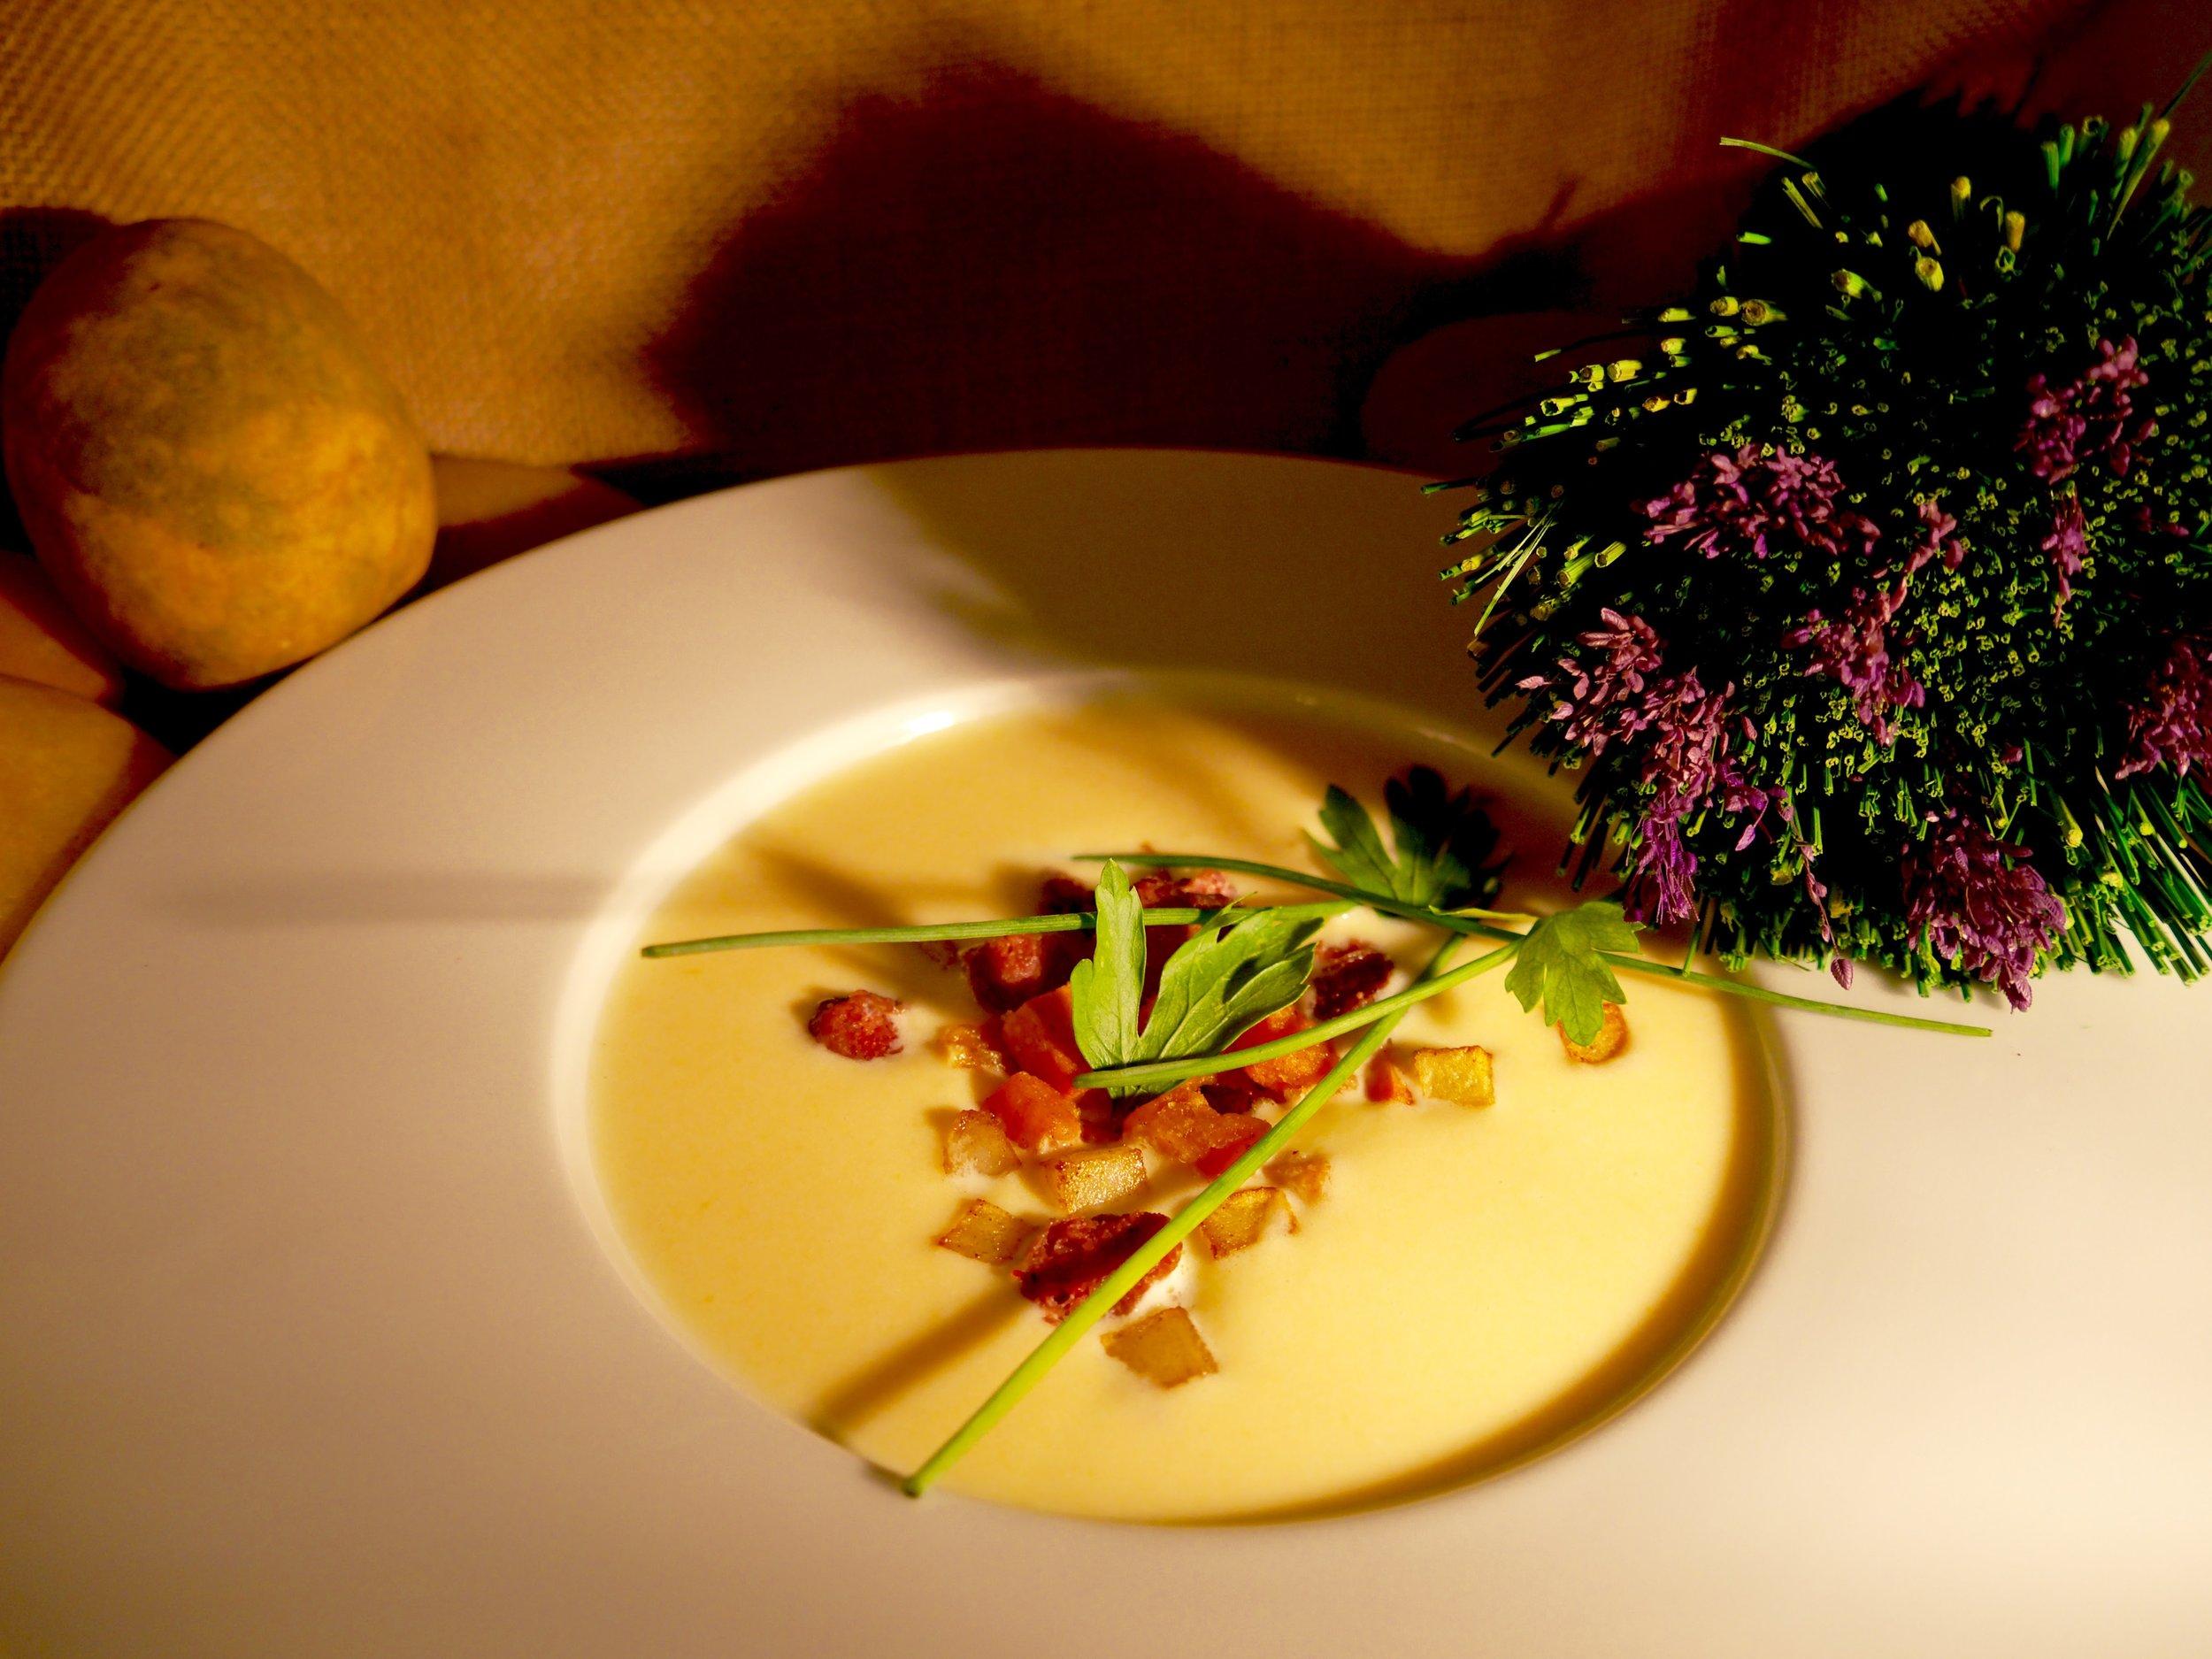 Potato+soupIMG36.jpg